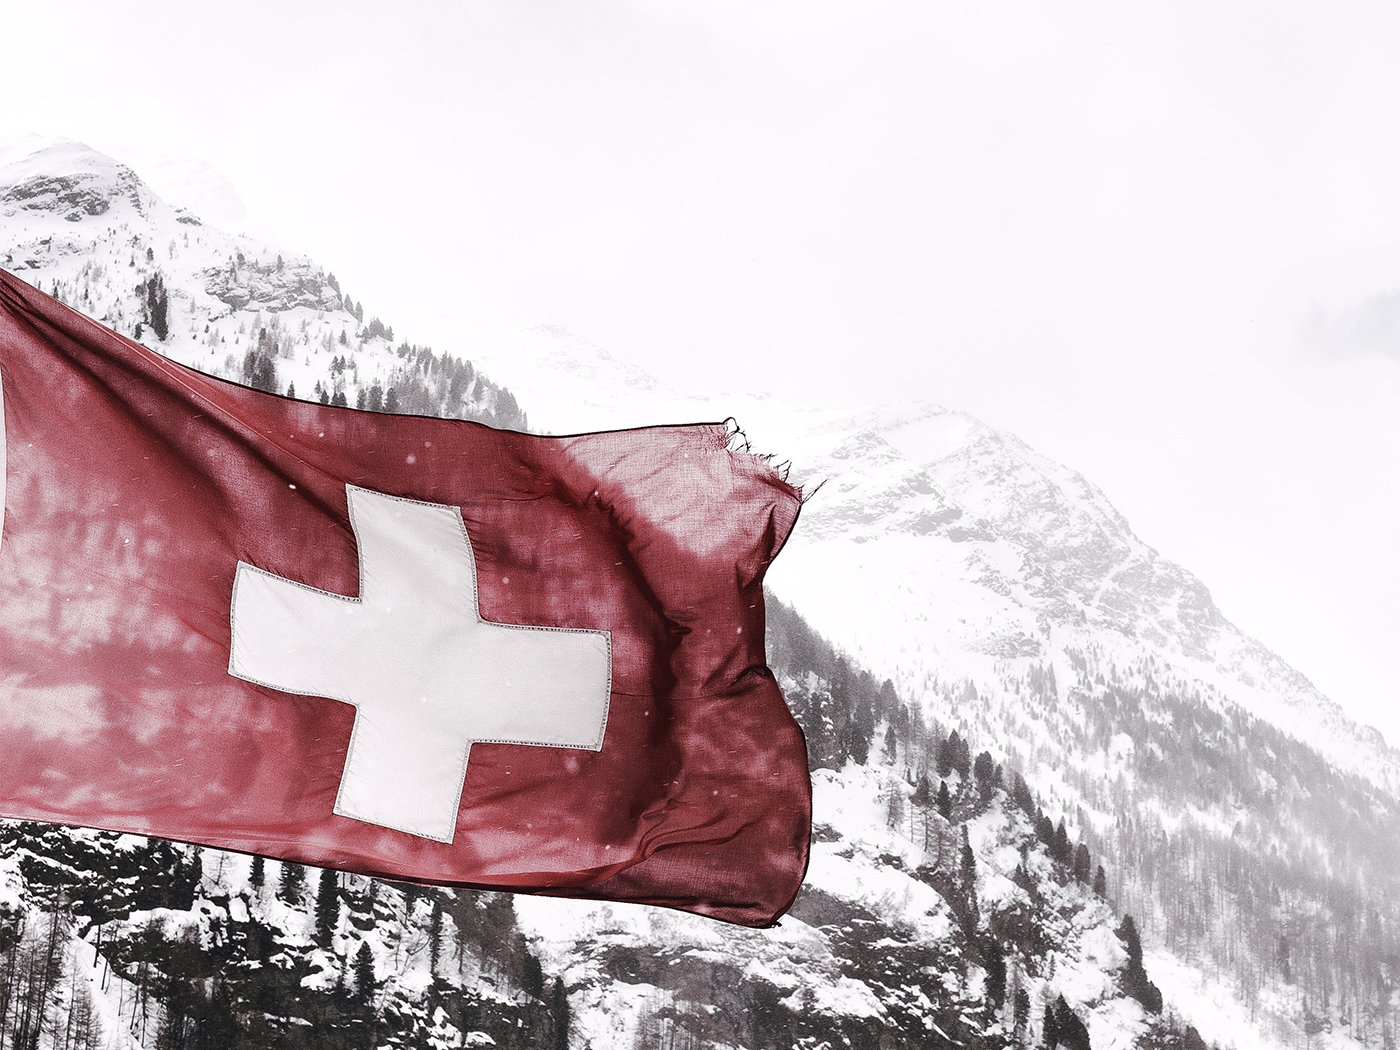 Mautgebuehren Schweiz Flagge Berge Schnee